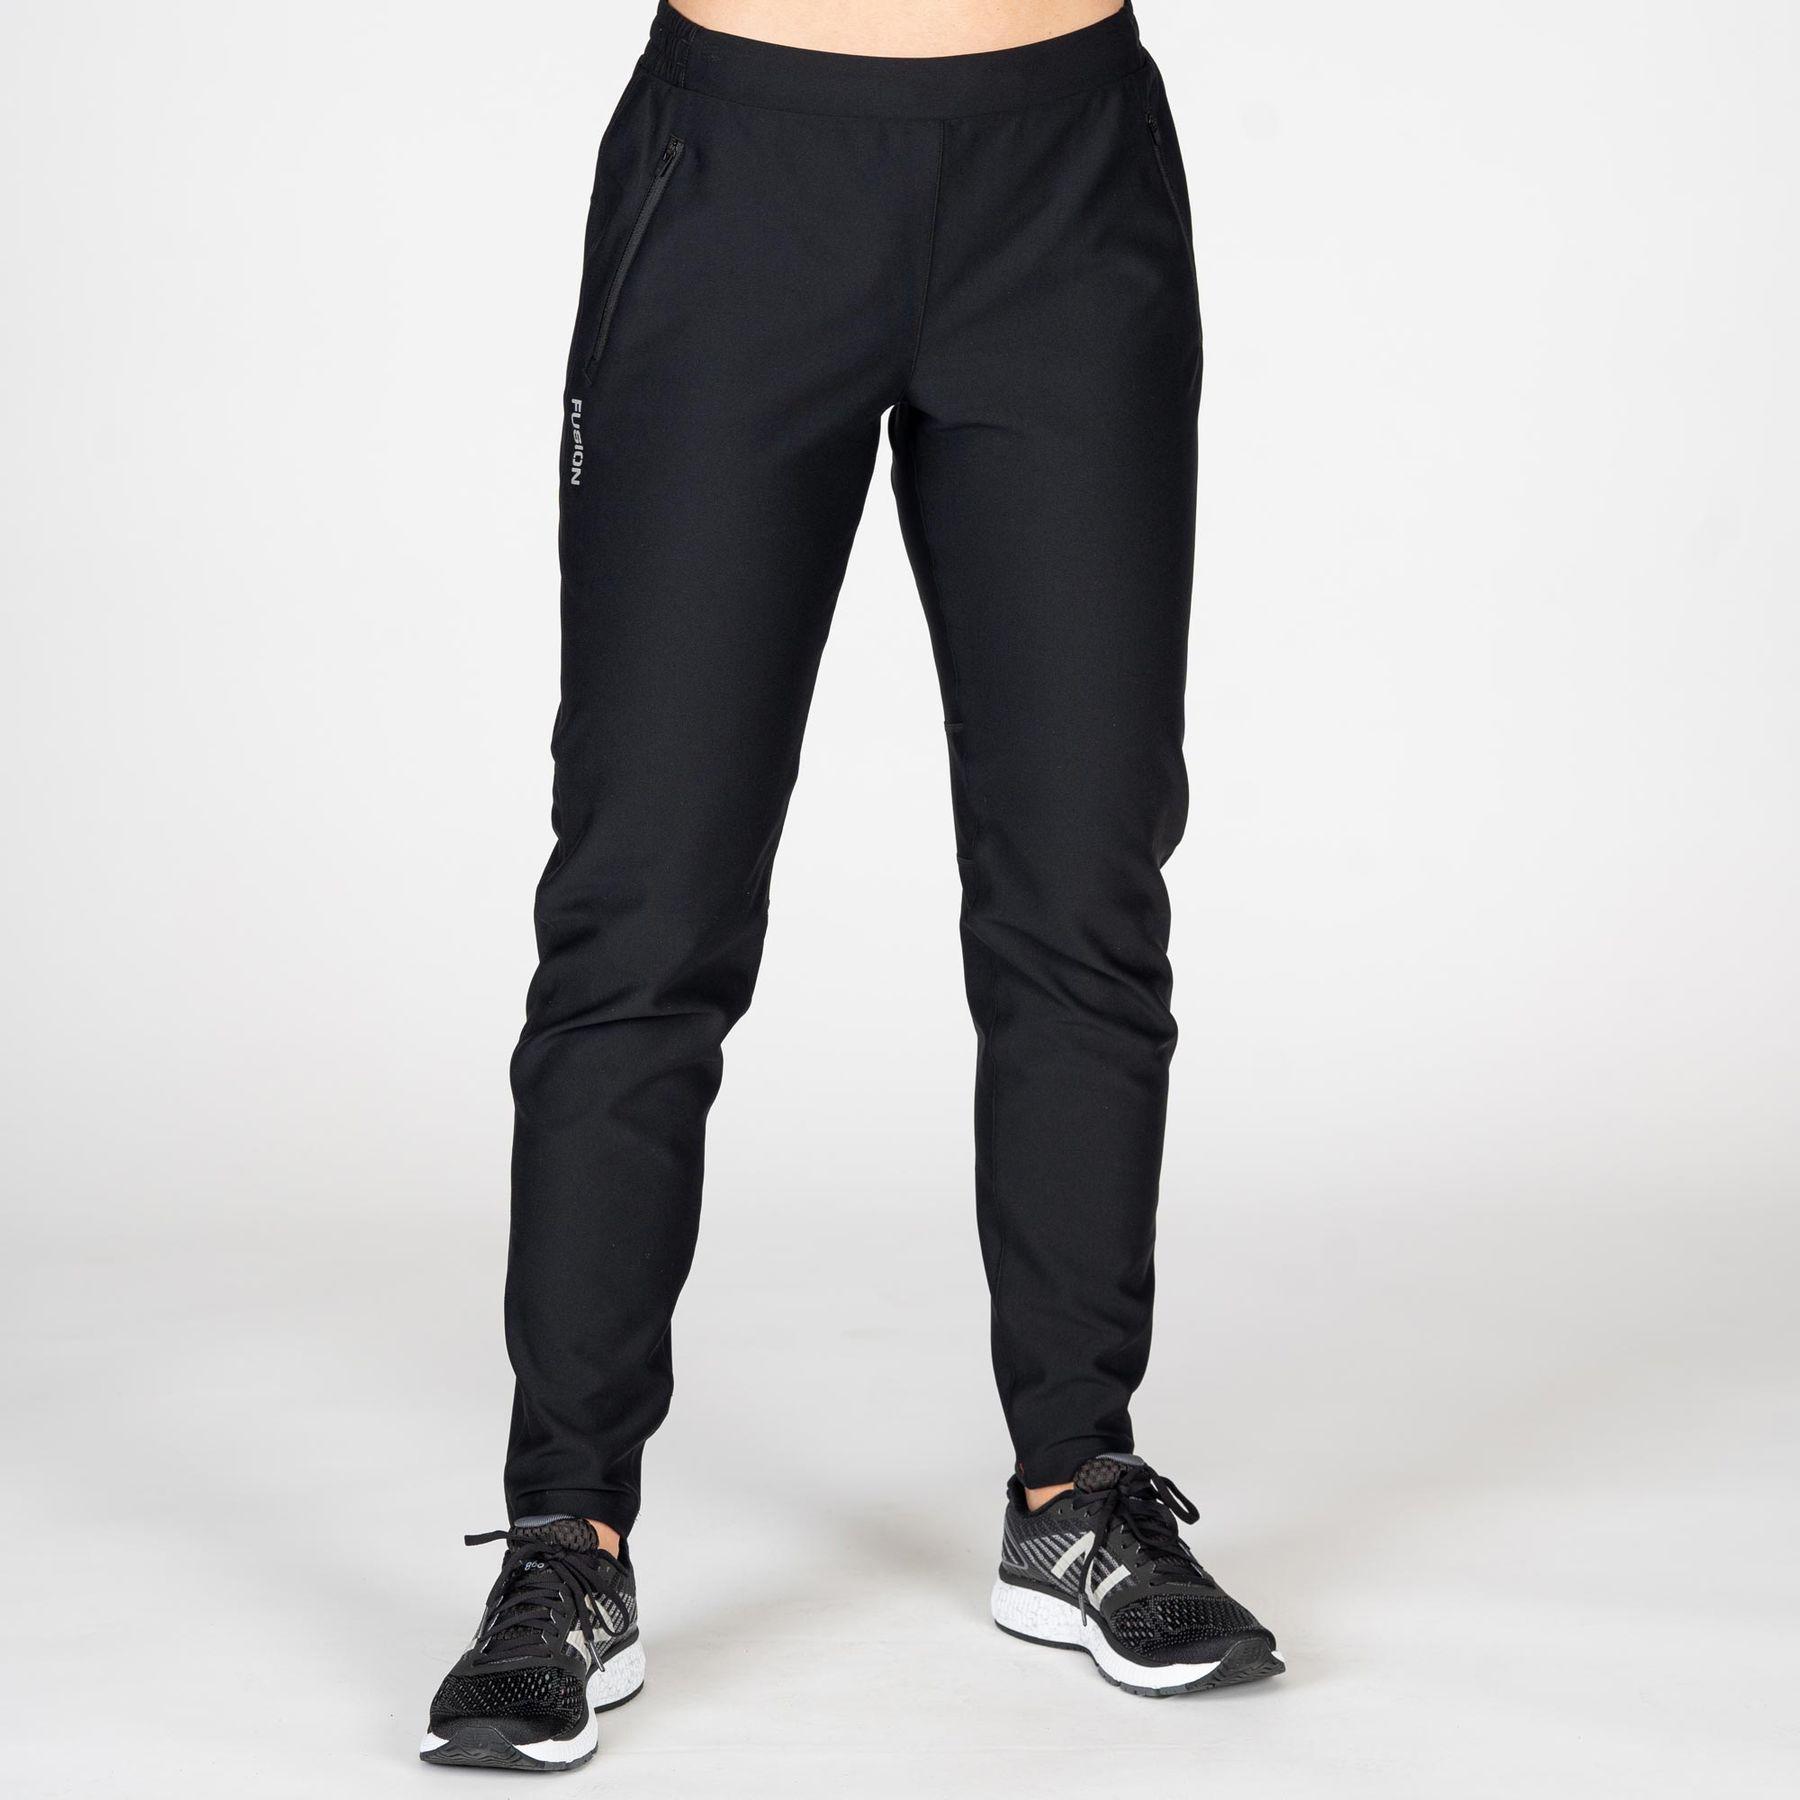 Fusion Womens Recharge Pants (Black)